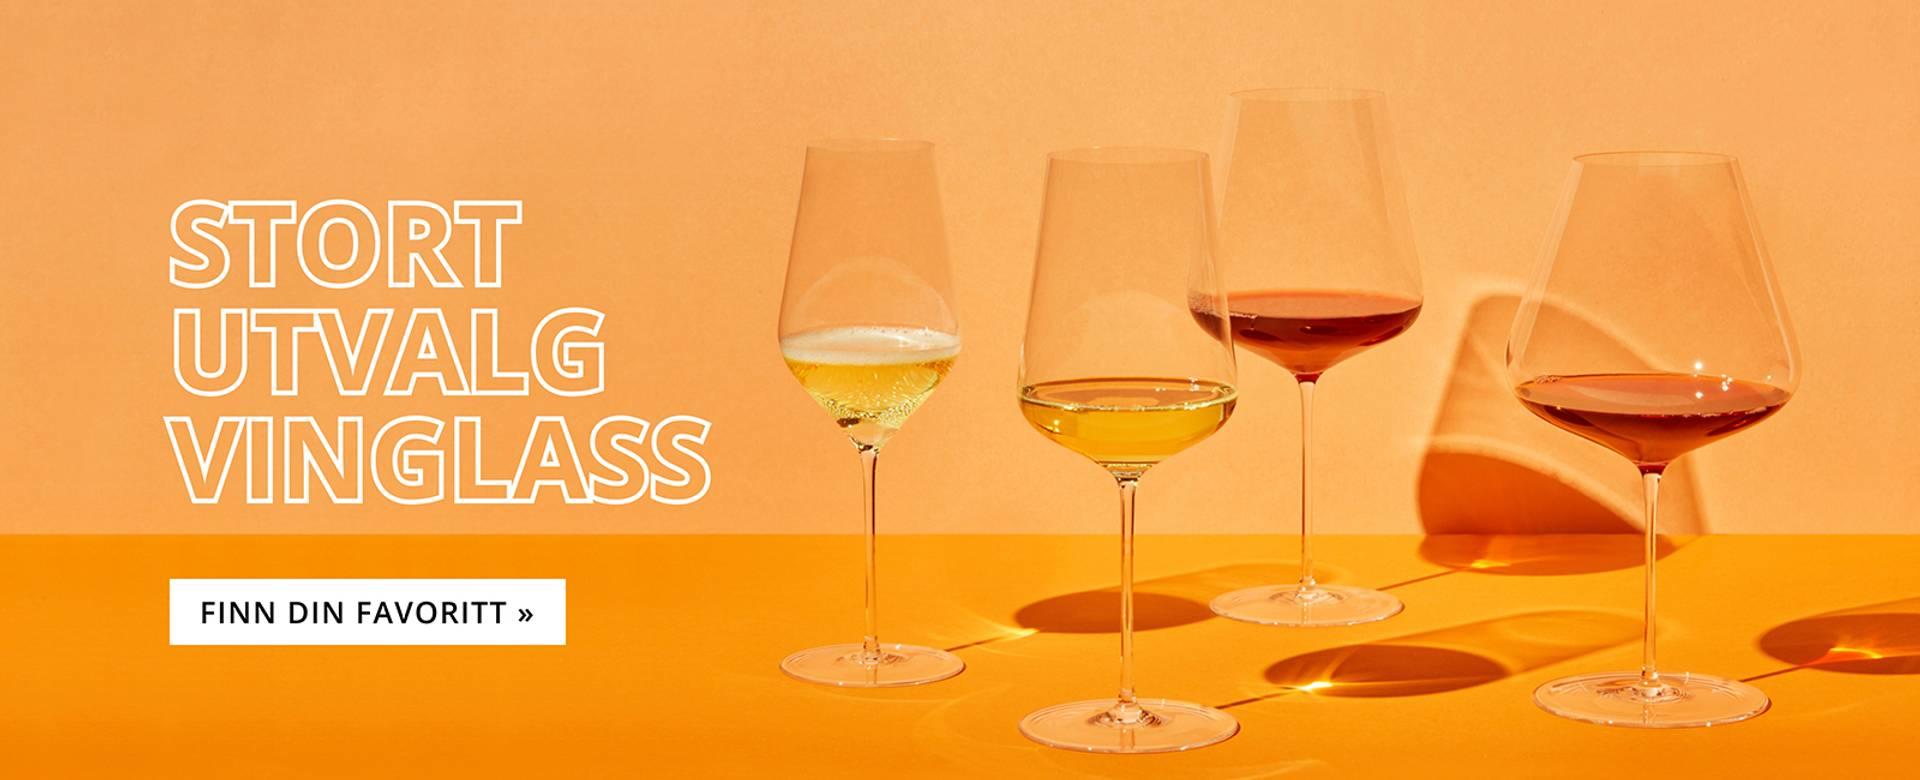 Se vårt store utvalg av vinglass - Riedel, Zalto, Lehmann, Grassl, Jancis Robinson